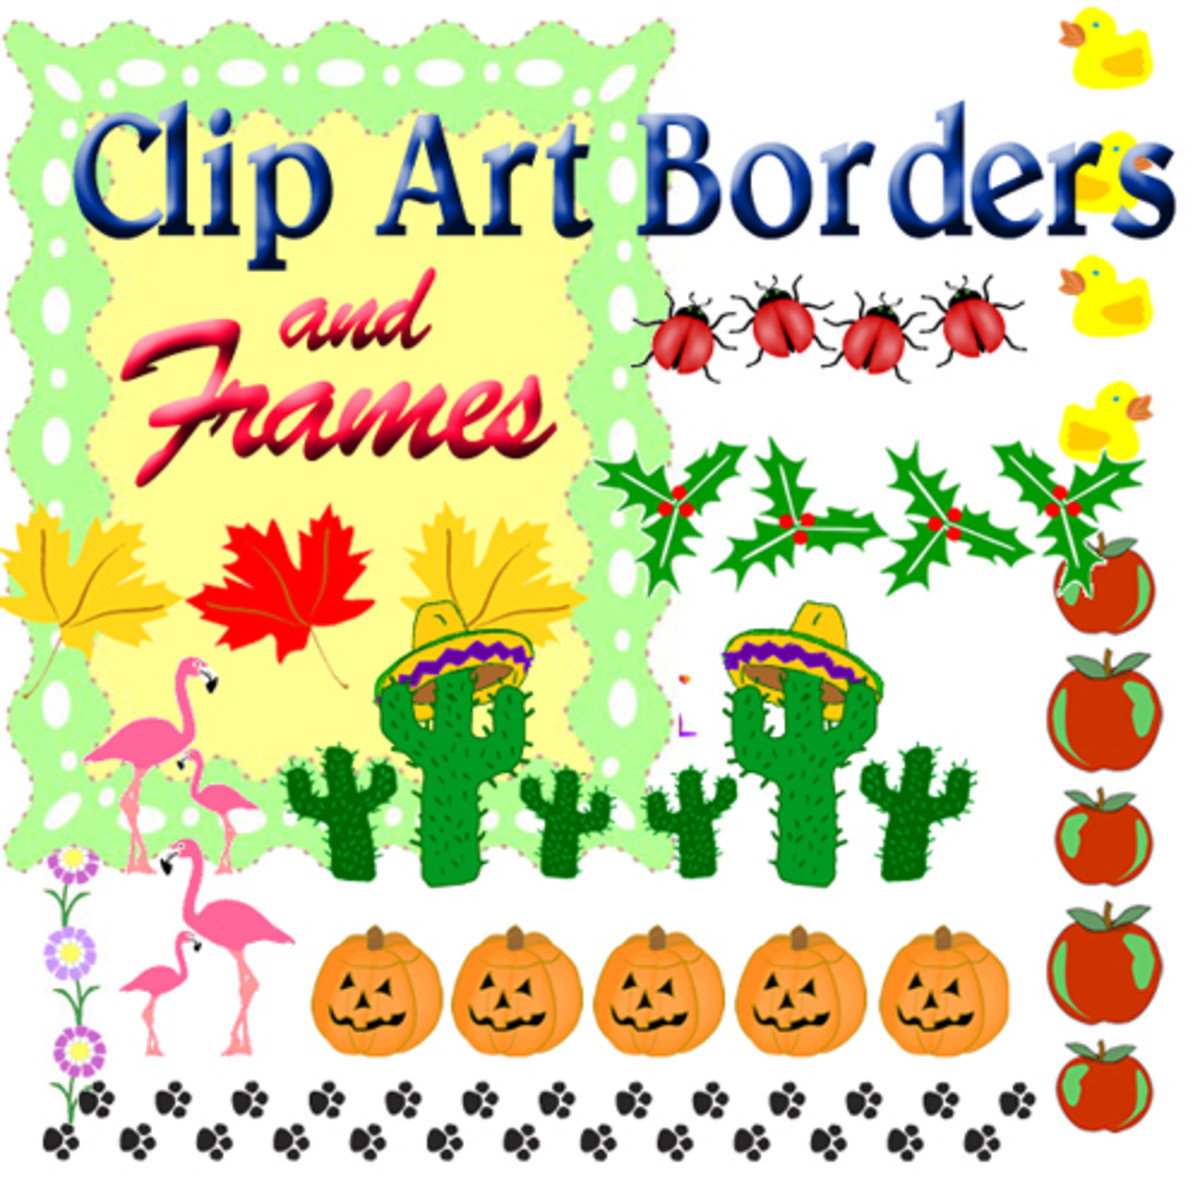 Clip Art Borders & Frames